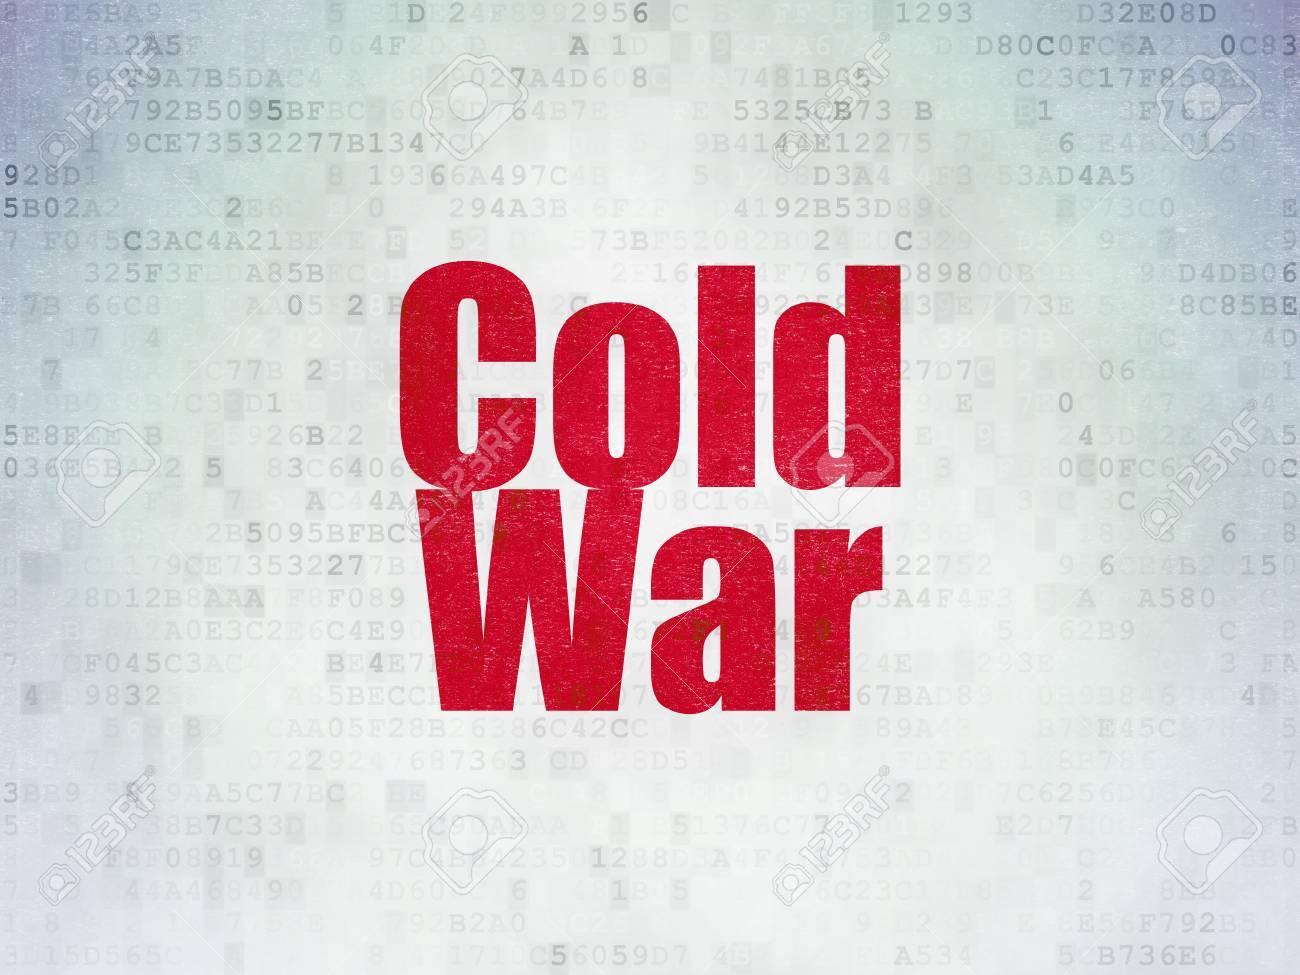 The New Cold War? By Aasim Sajjad Akhtar